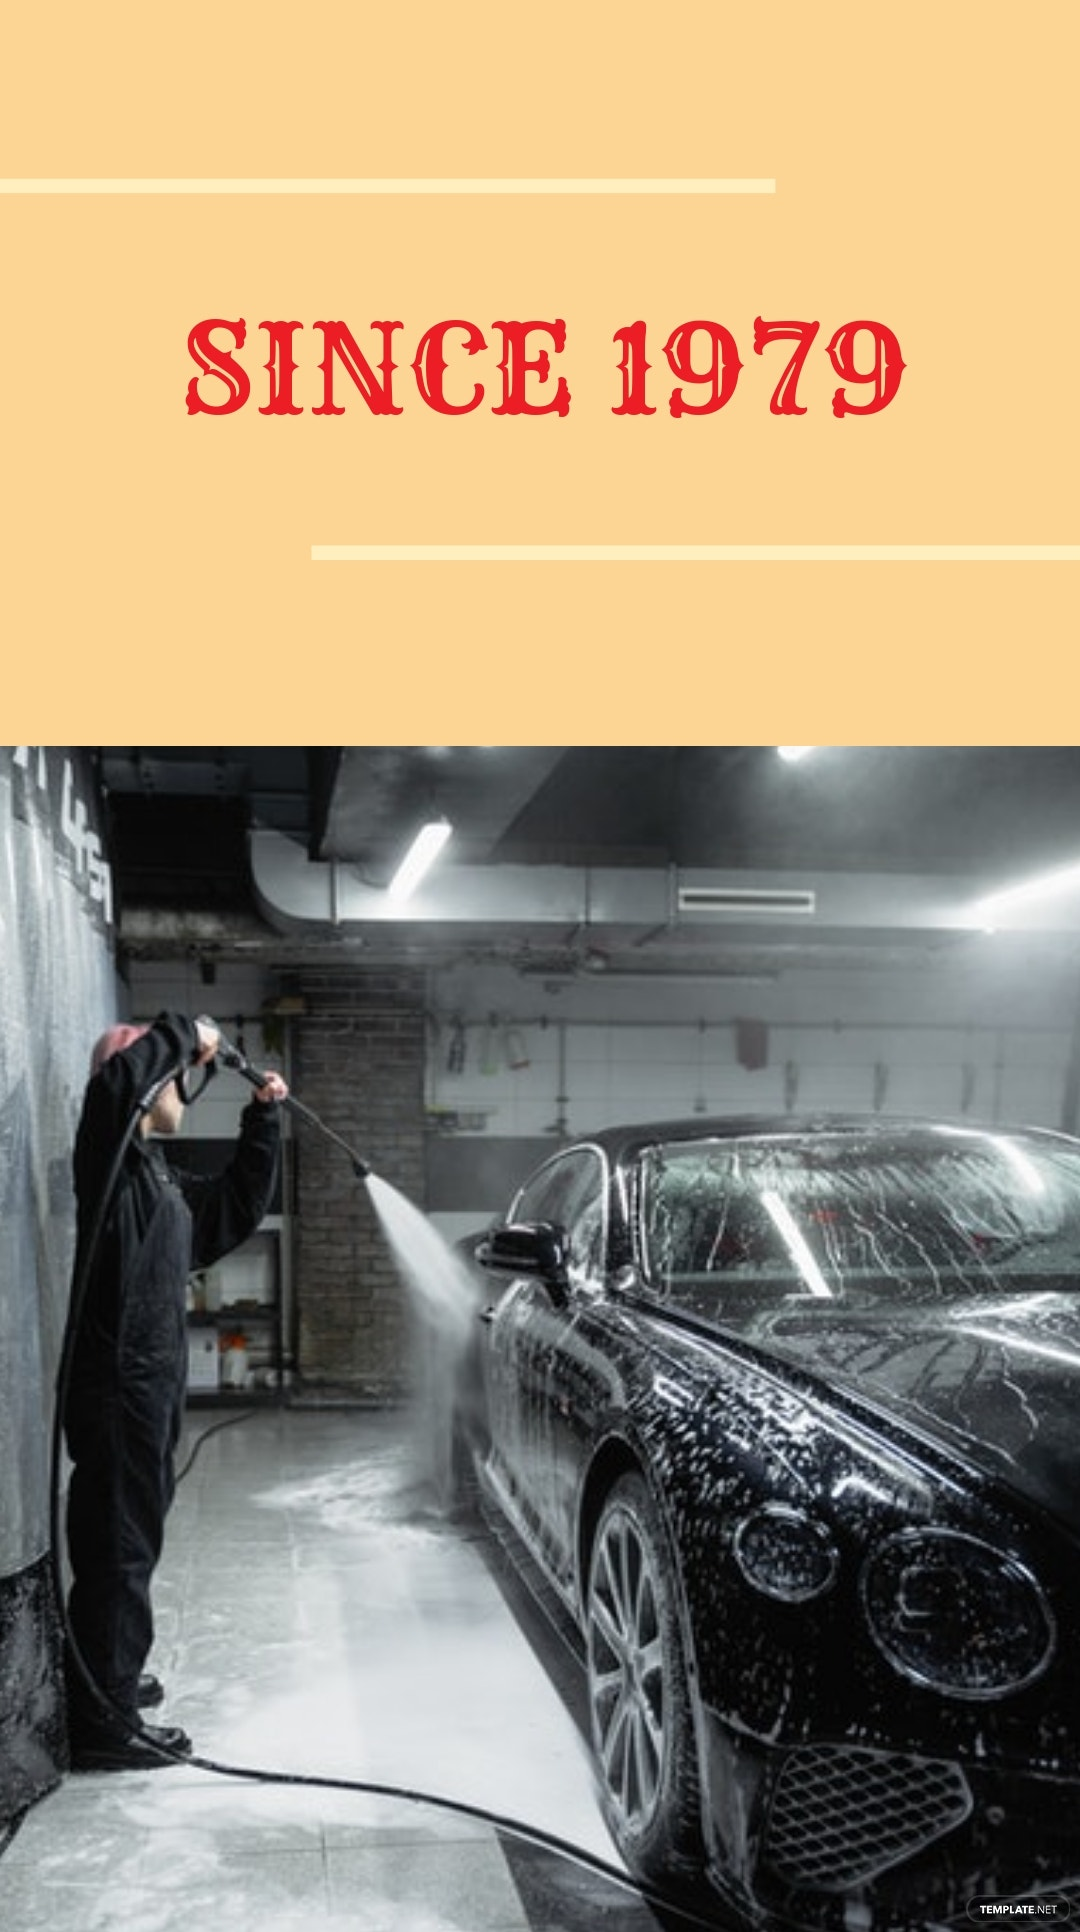 Vintage Car Wash Instagram Story Template 3.jpe